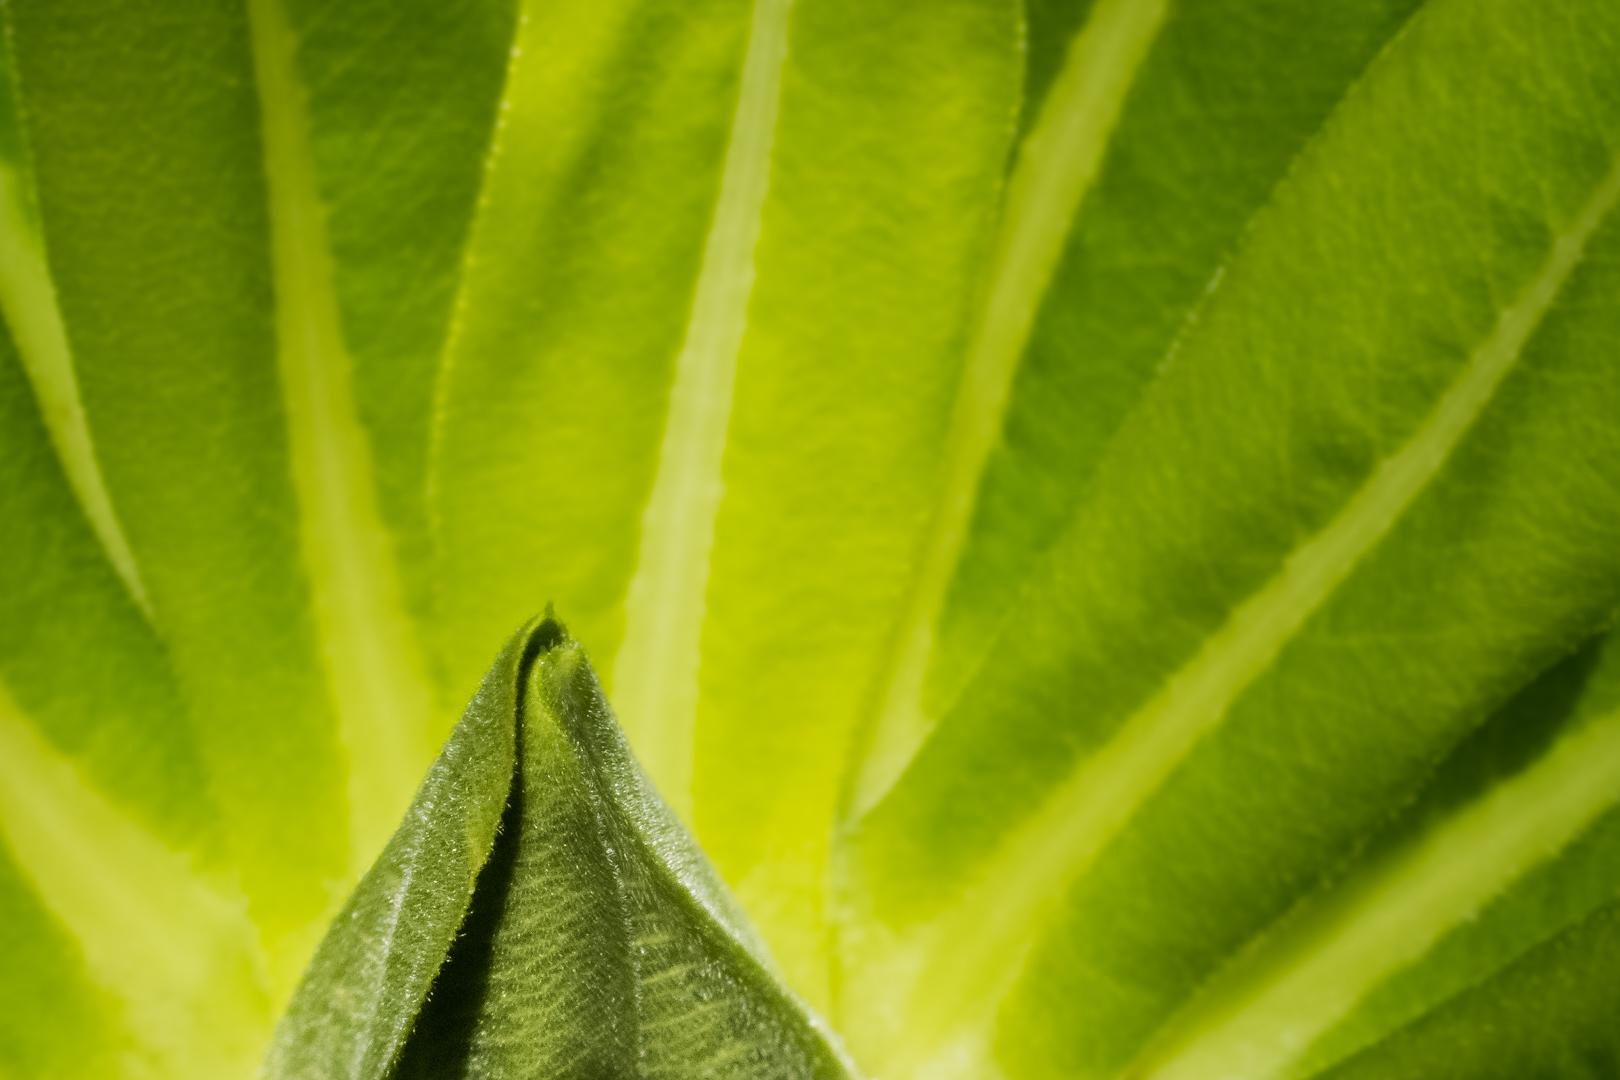 Copy of Kim Butterworth - Botanical Bloom